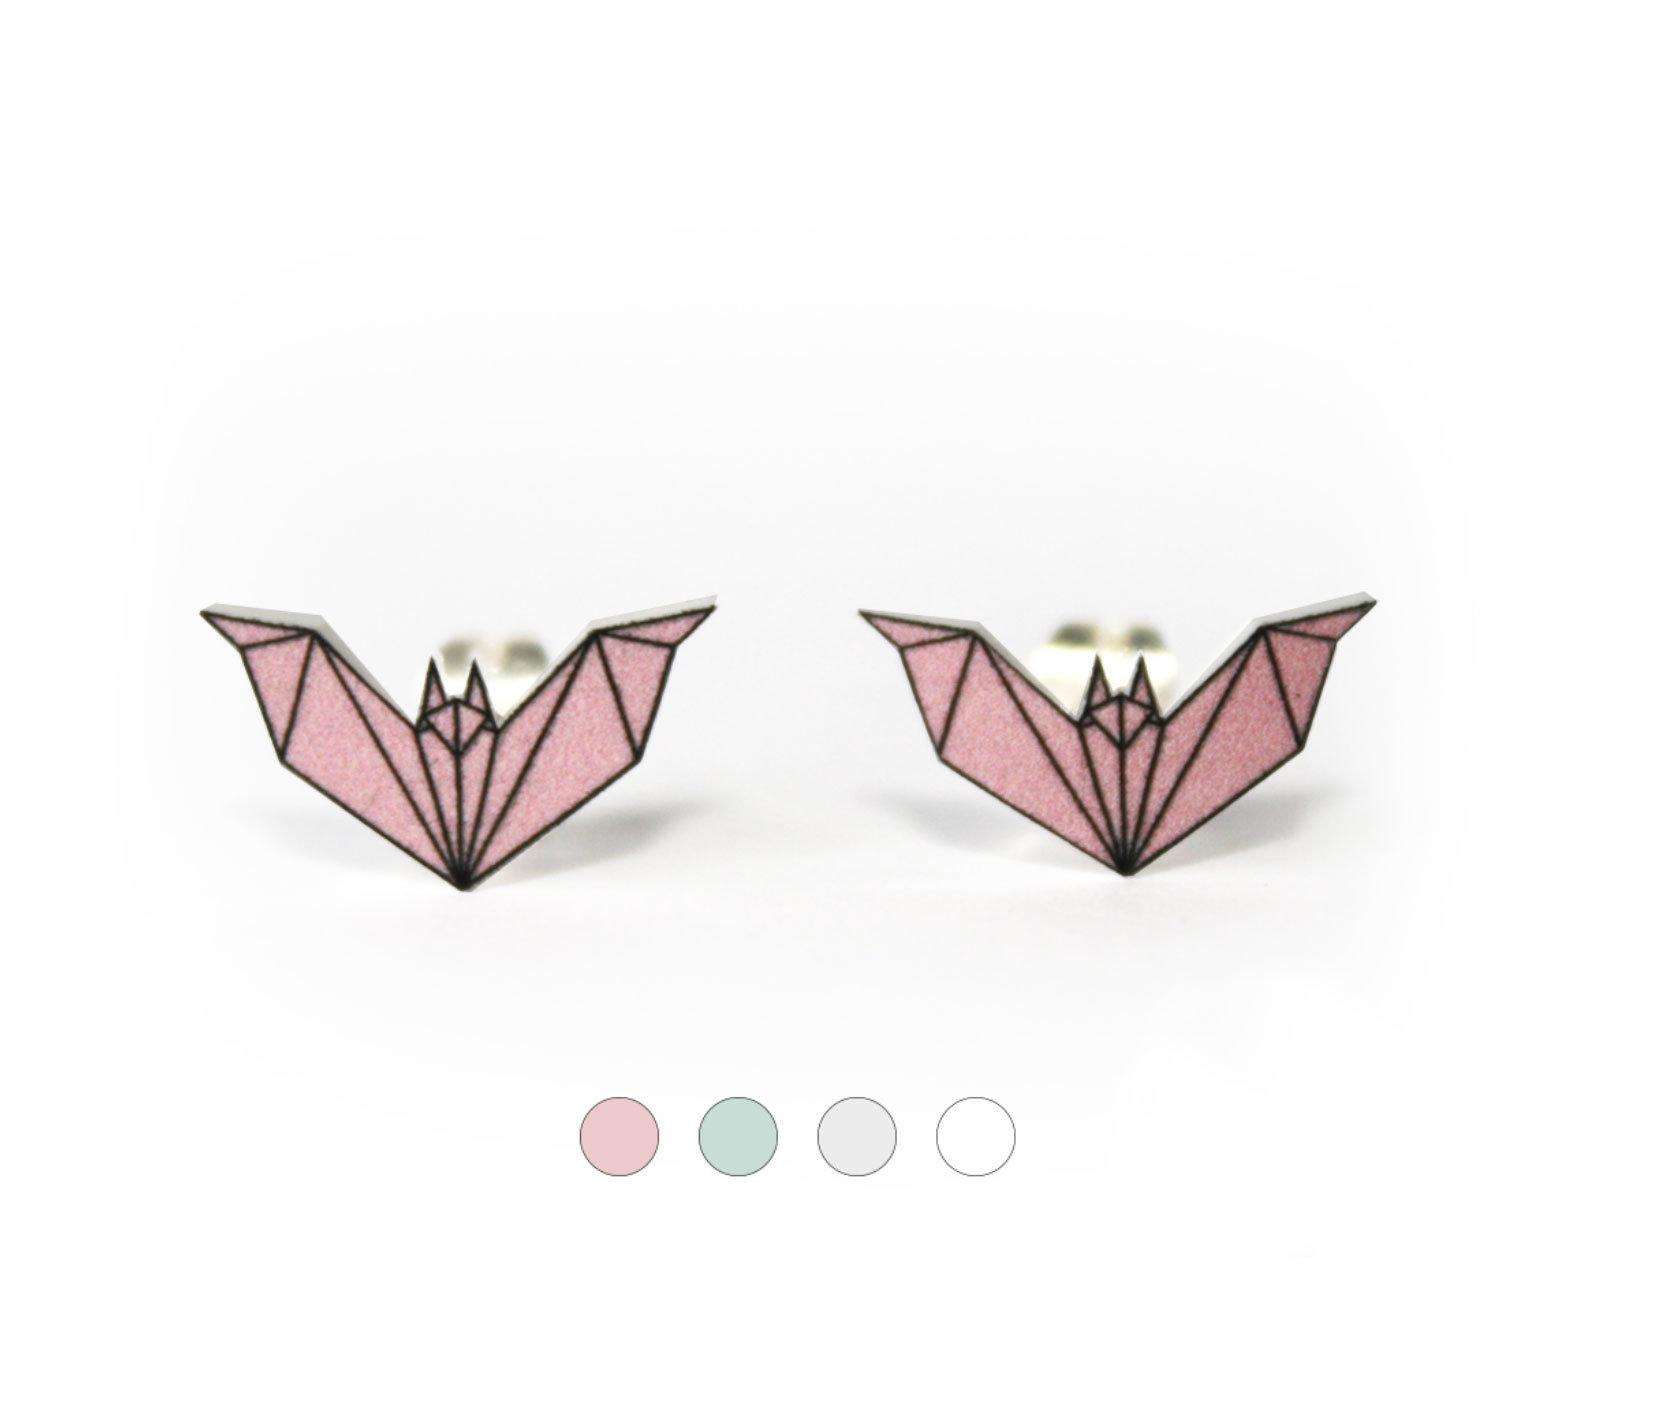 Origami Coll. / Bat / Dusty Rose (UDGÅR!) Ori_Bat_DuRo